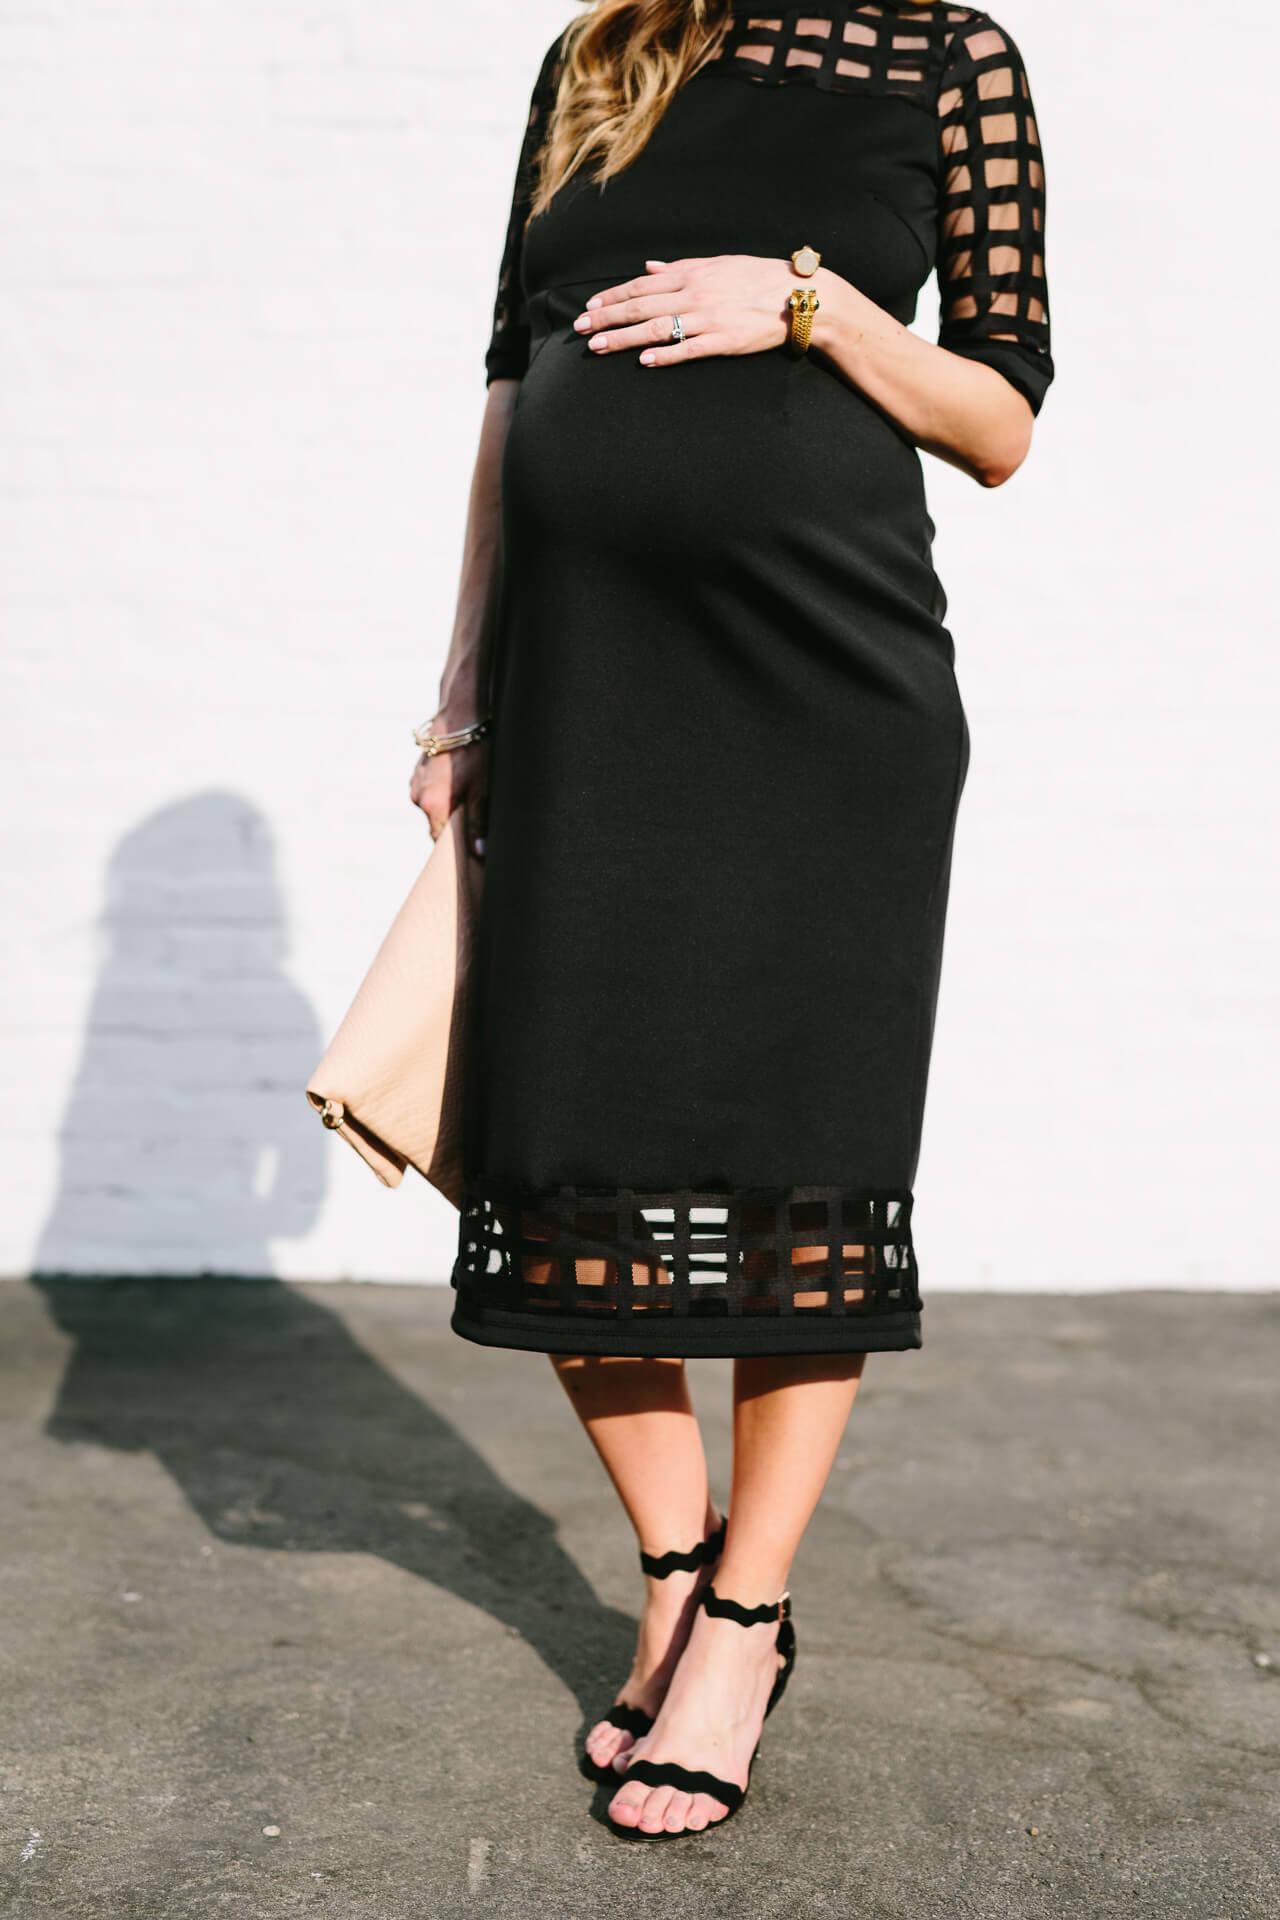 dress the bump in a little black dress